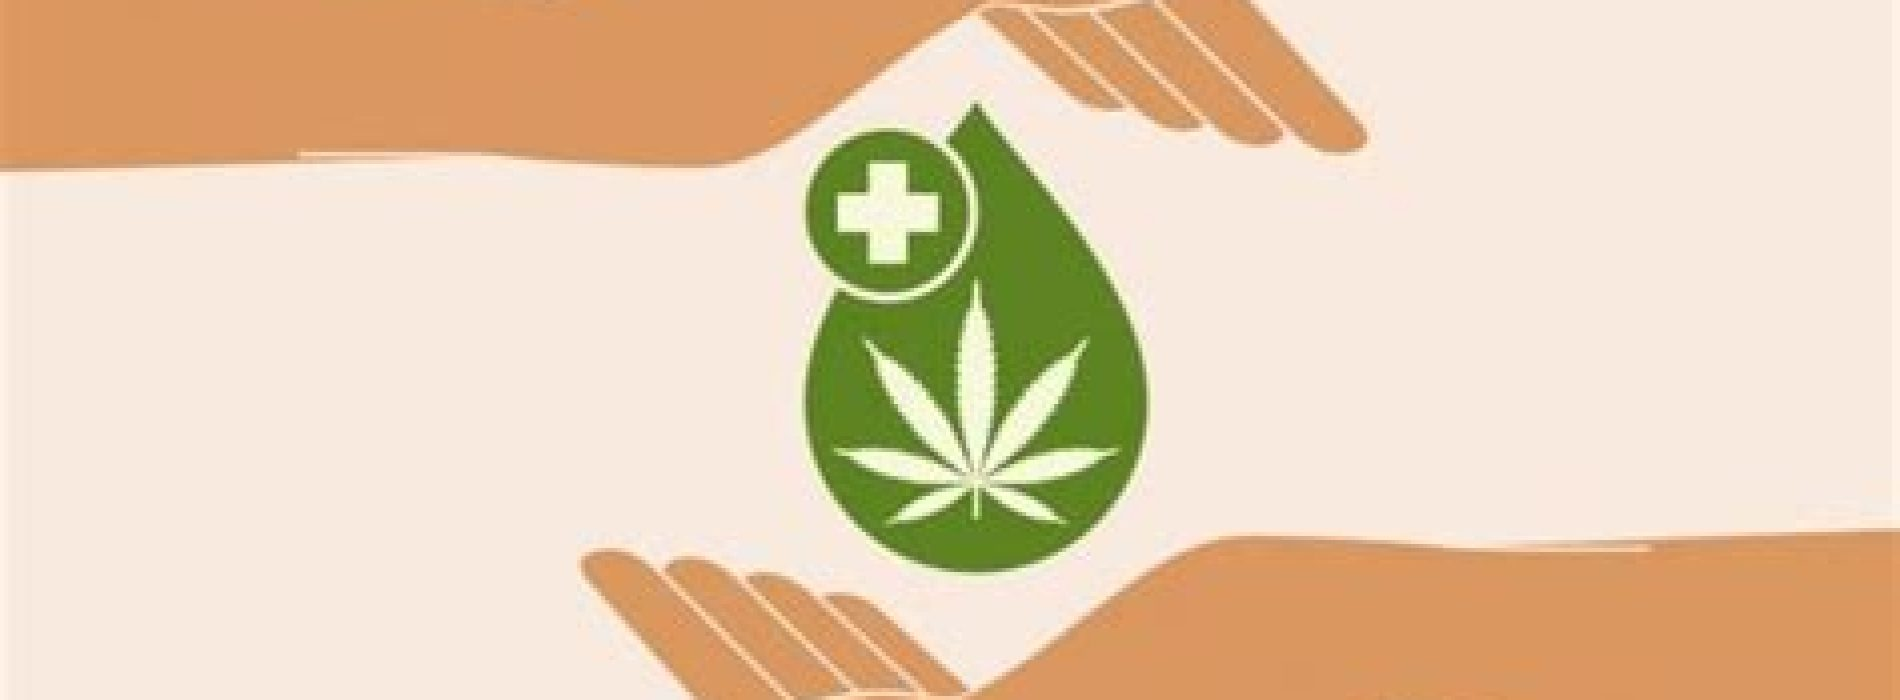 Covid-19, immuunfunctie en cannabis